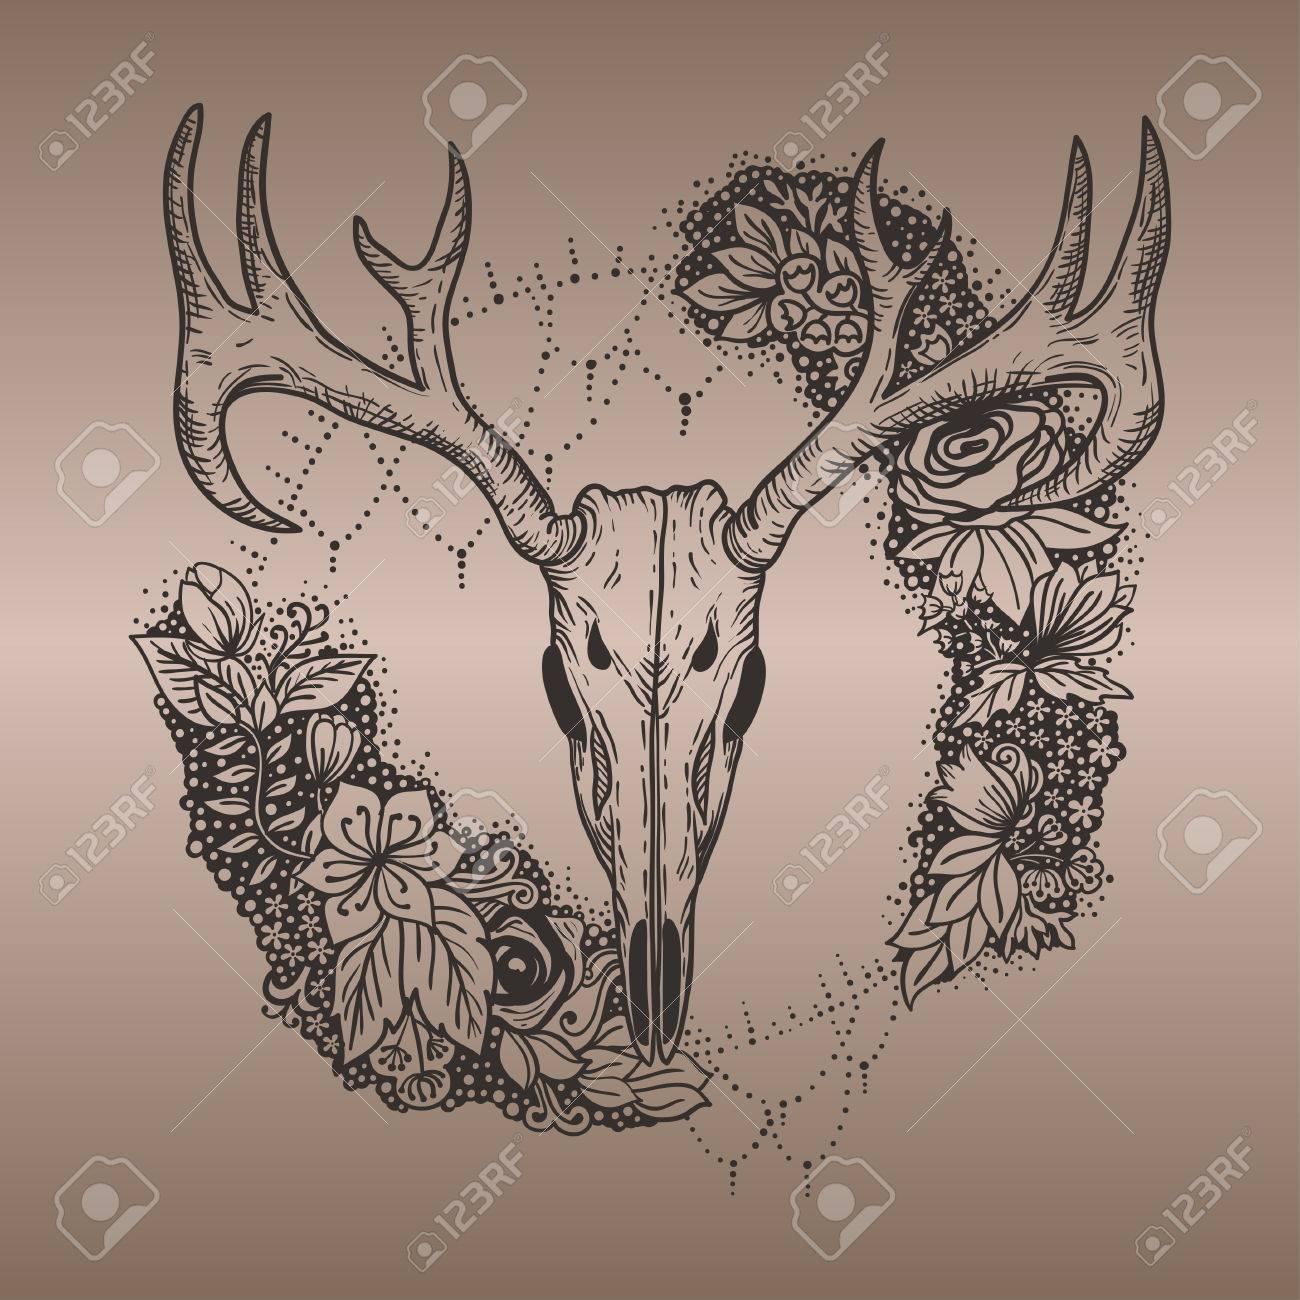 Stylized Deer Skull And Flowers Hand Drawn Original Illustration ...